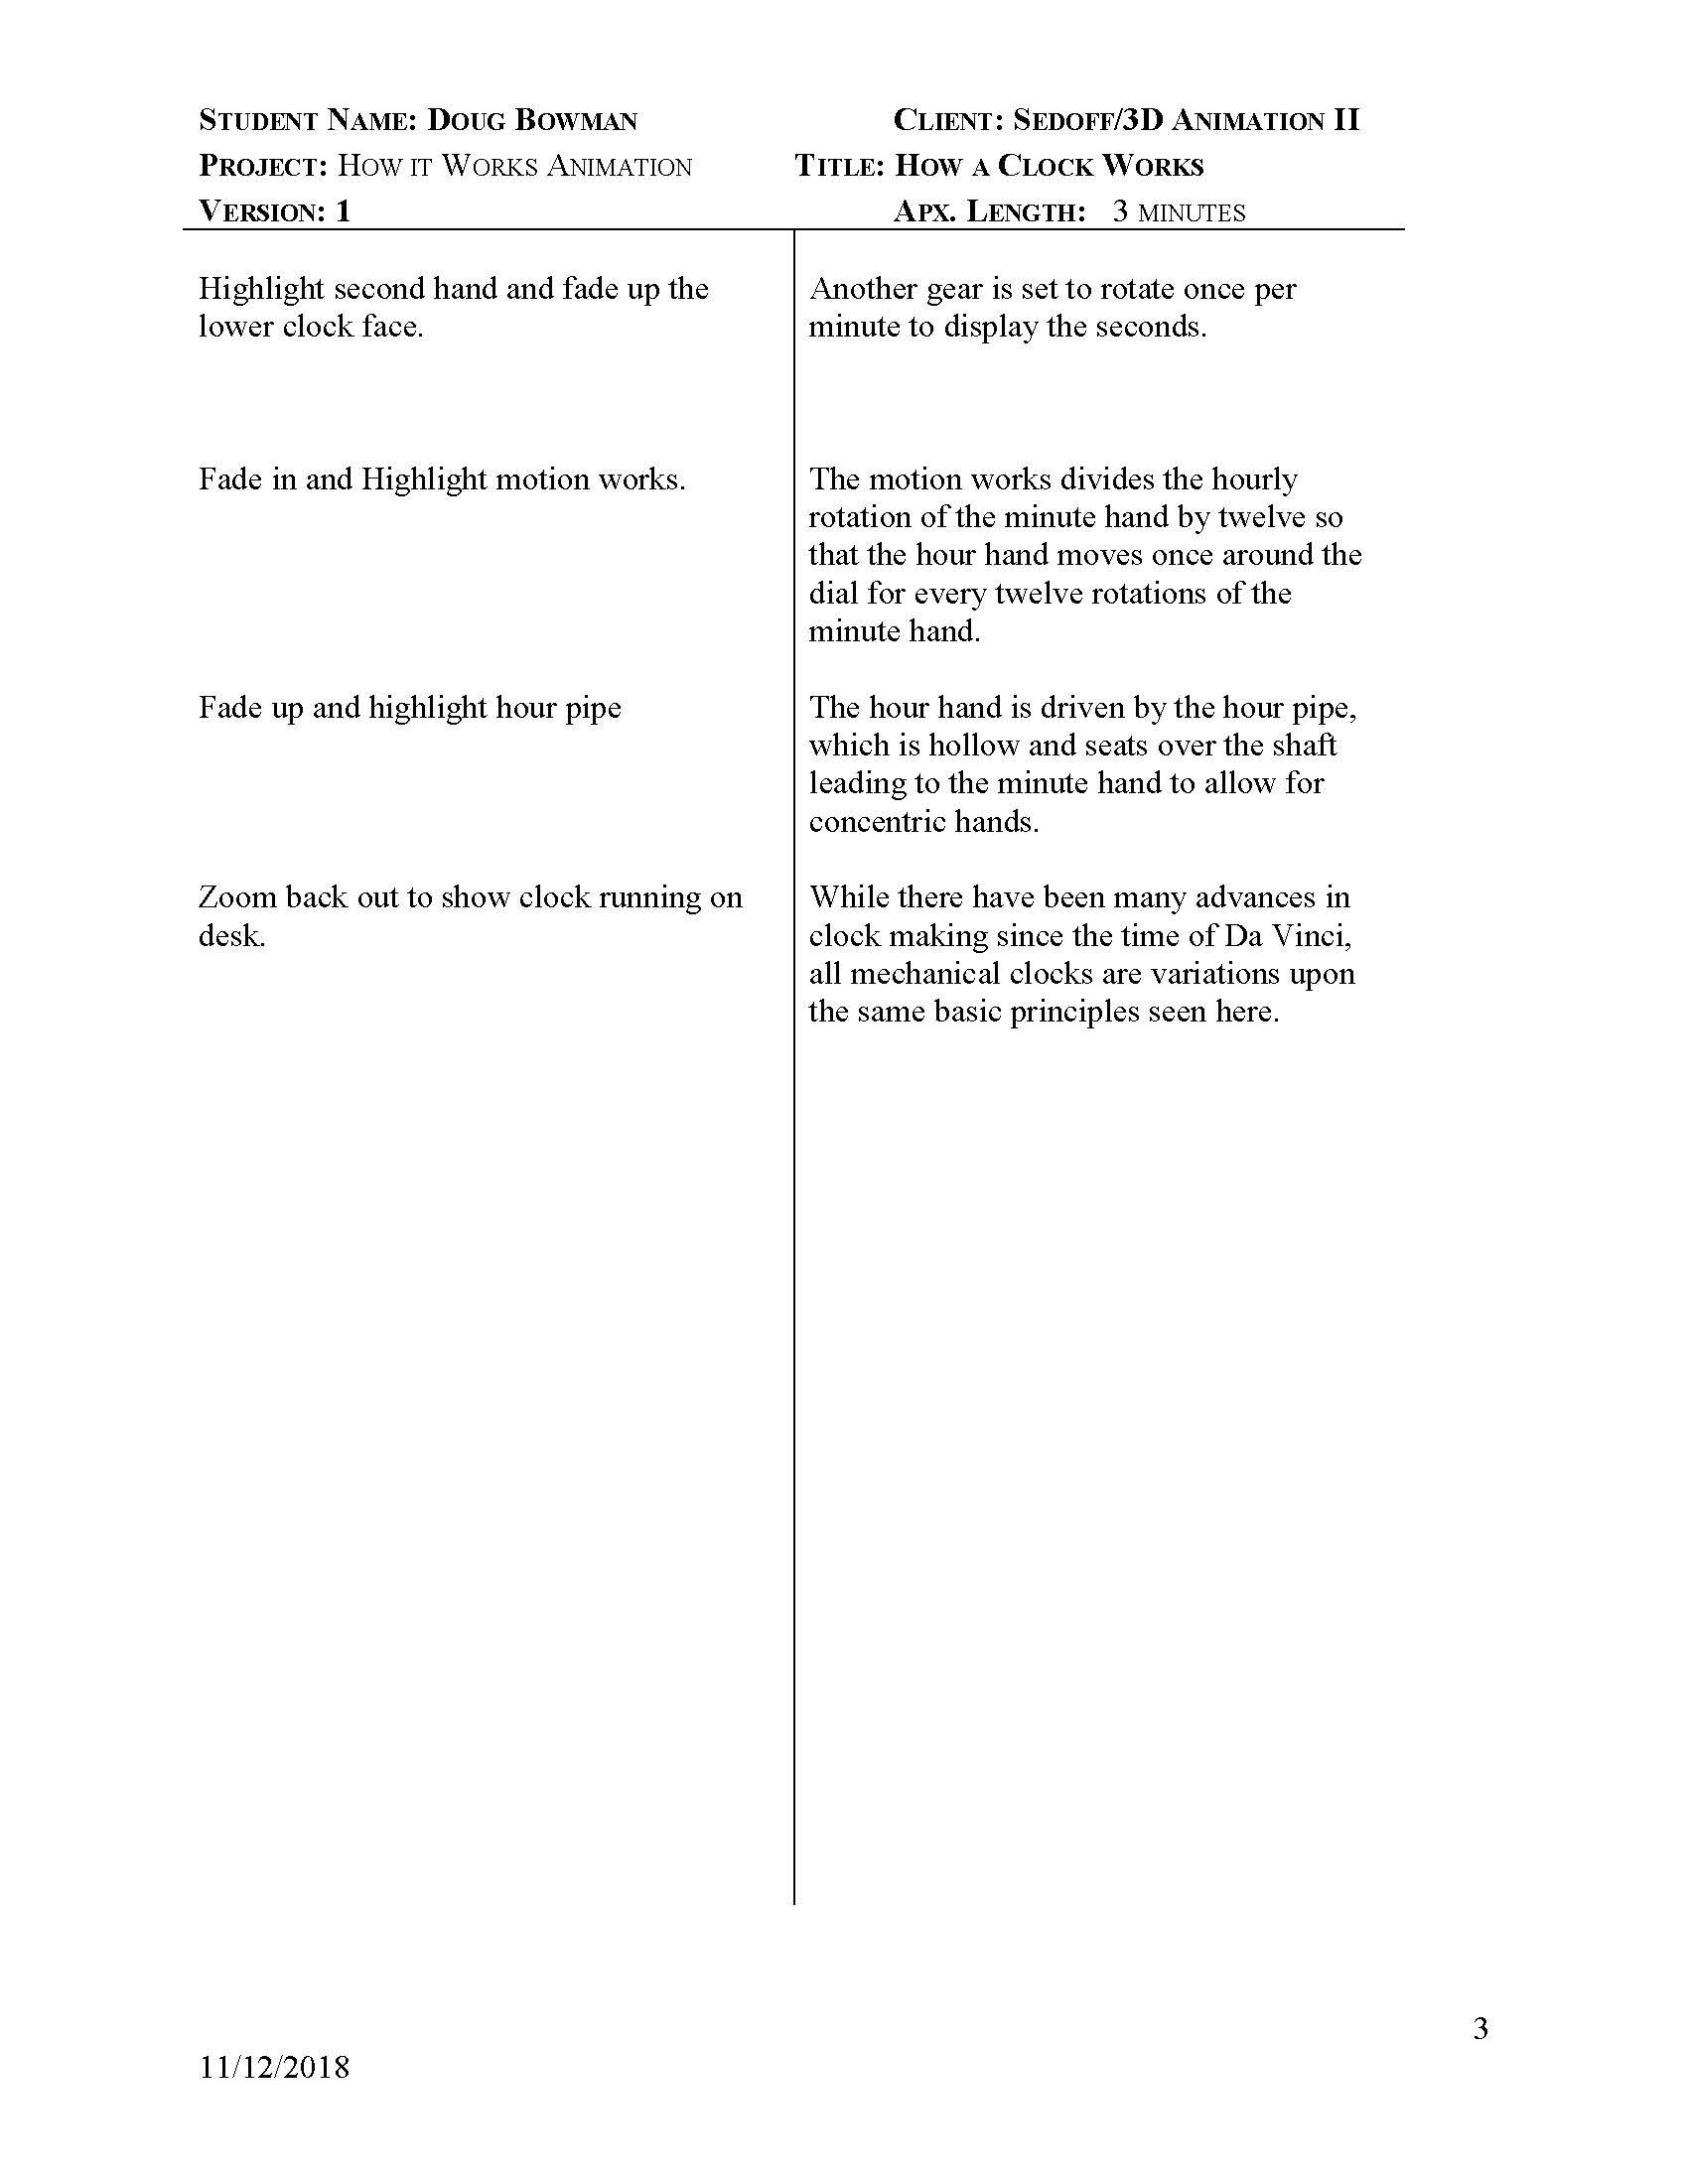 Bowman_Clock_Script_v1_Page_3.jpg